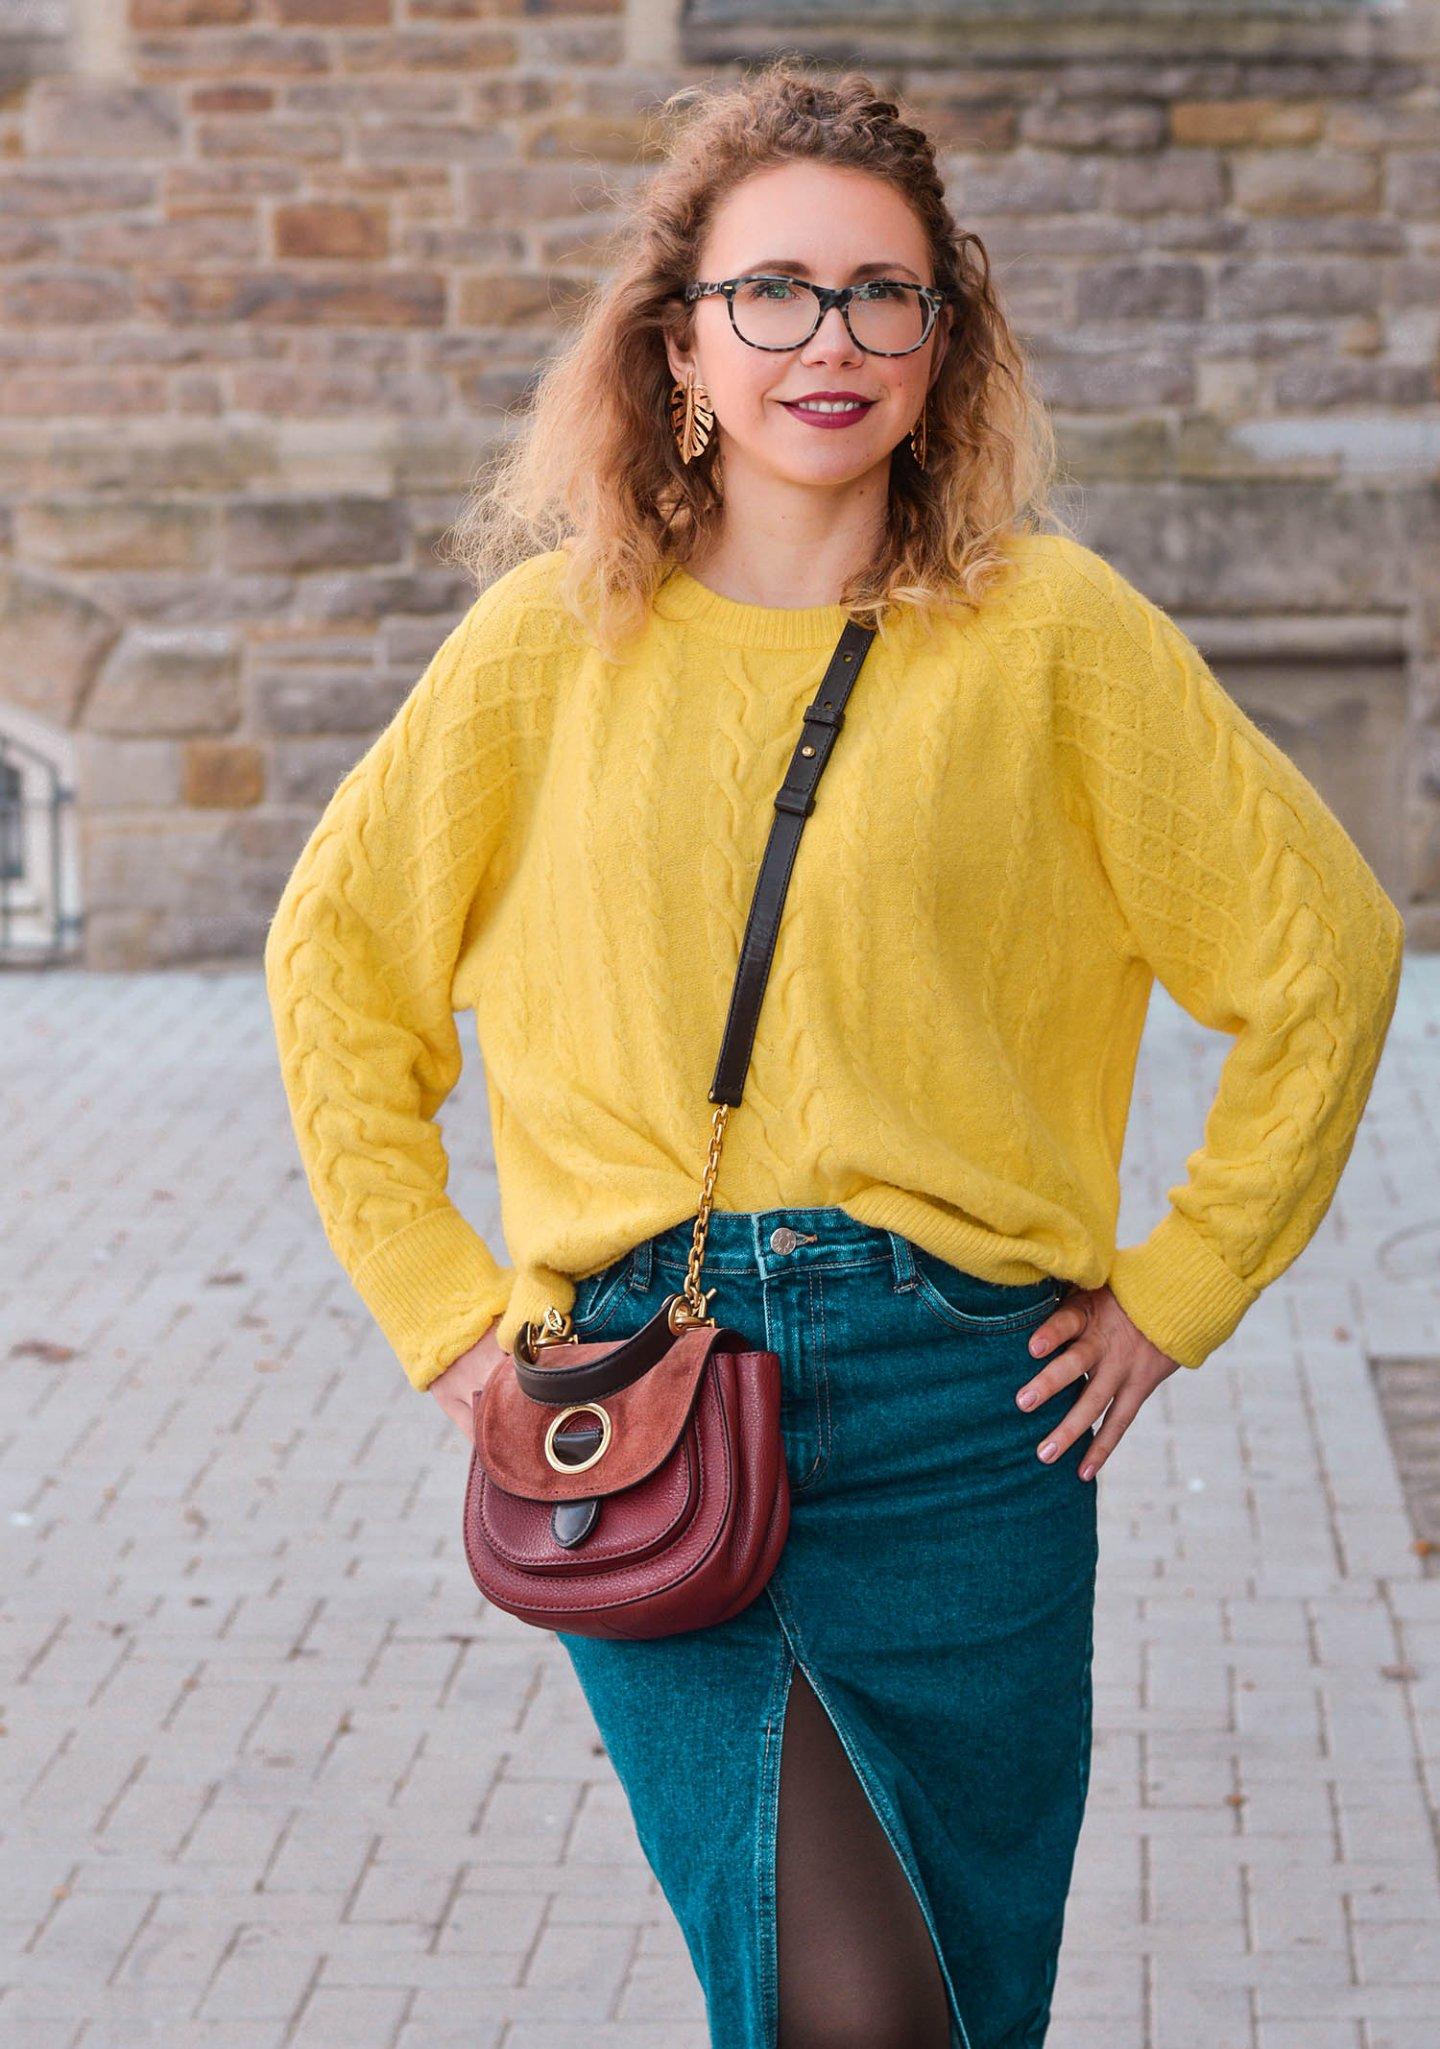 Frühlingsoutfit mit Trendfarbe gelb